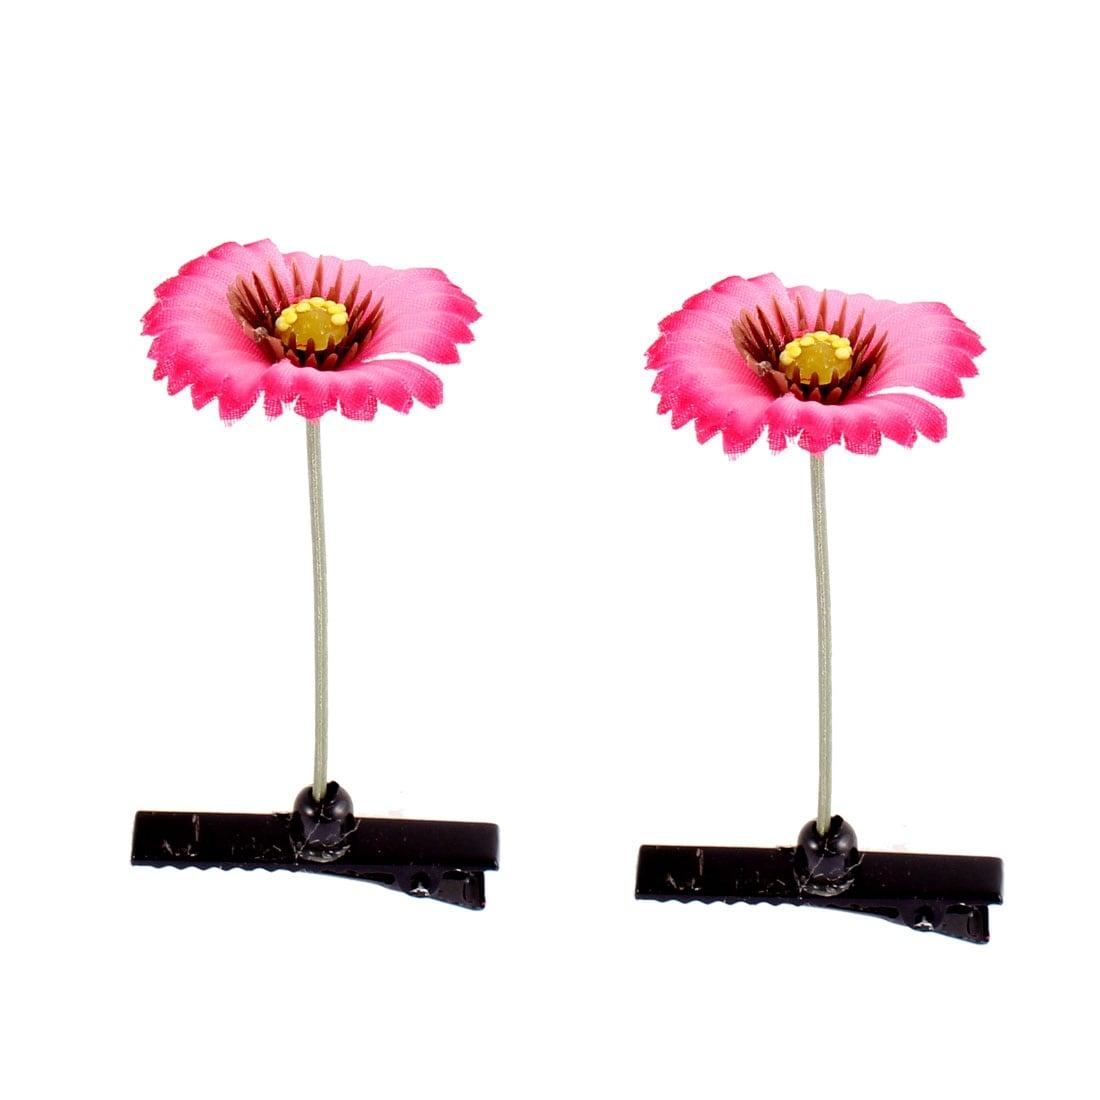 Shop Floral Antenna Hairpin Artificial Fuchsia Flower Hair Clips 2